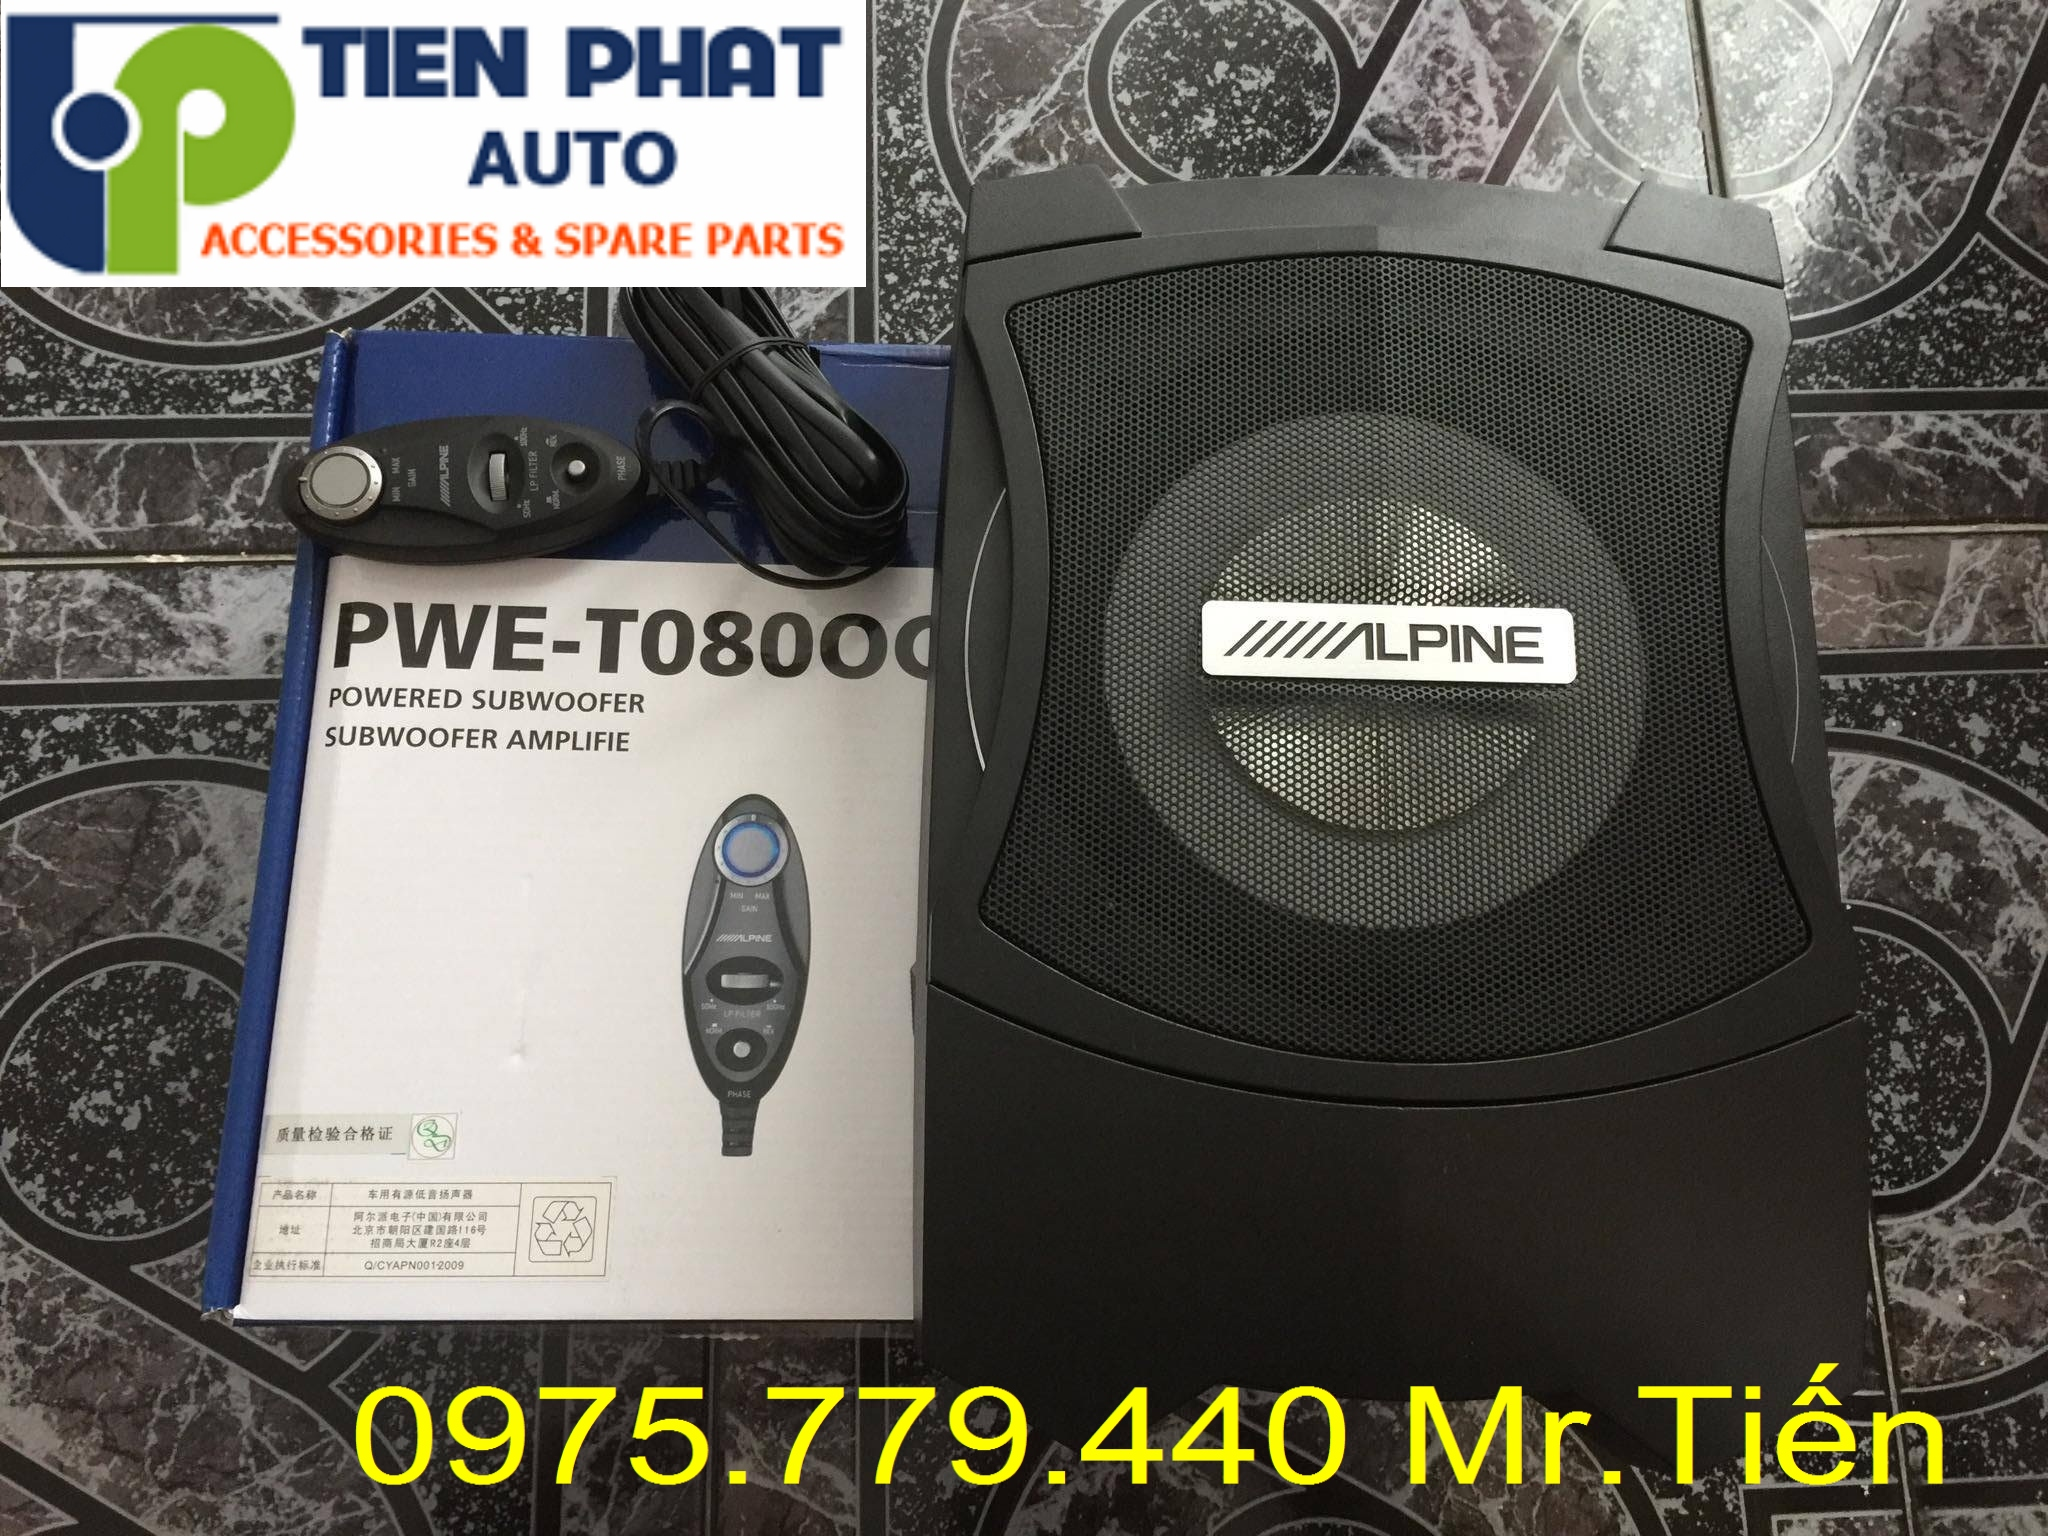 Lắp Loa sub Alpine PWE-T0800C cho Honda Odyssey Lắp Đặt Tận Nơi